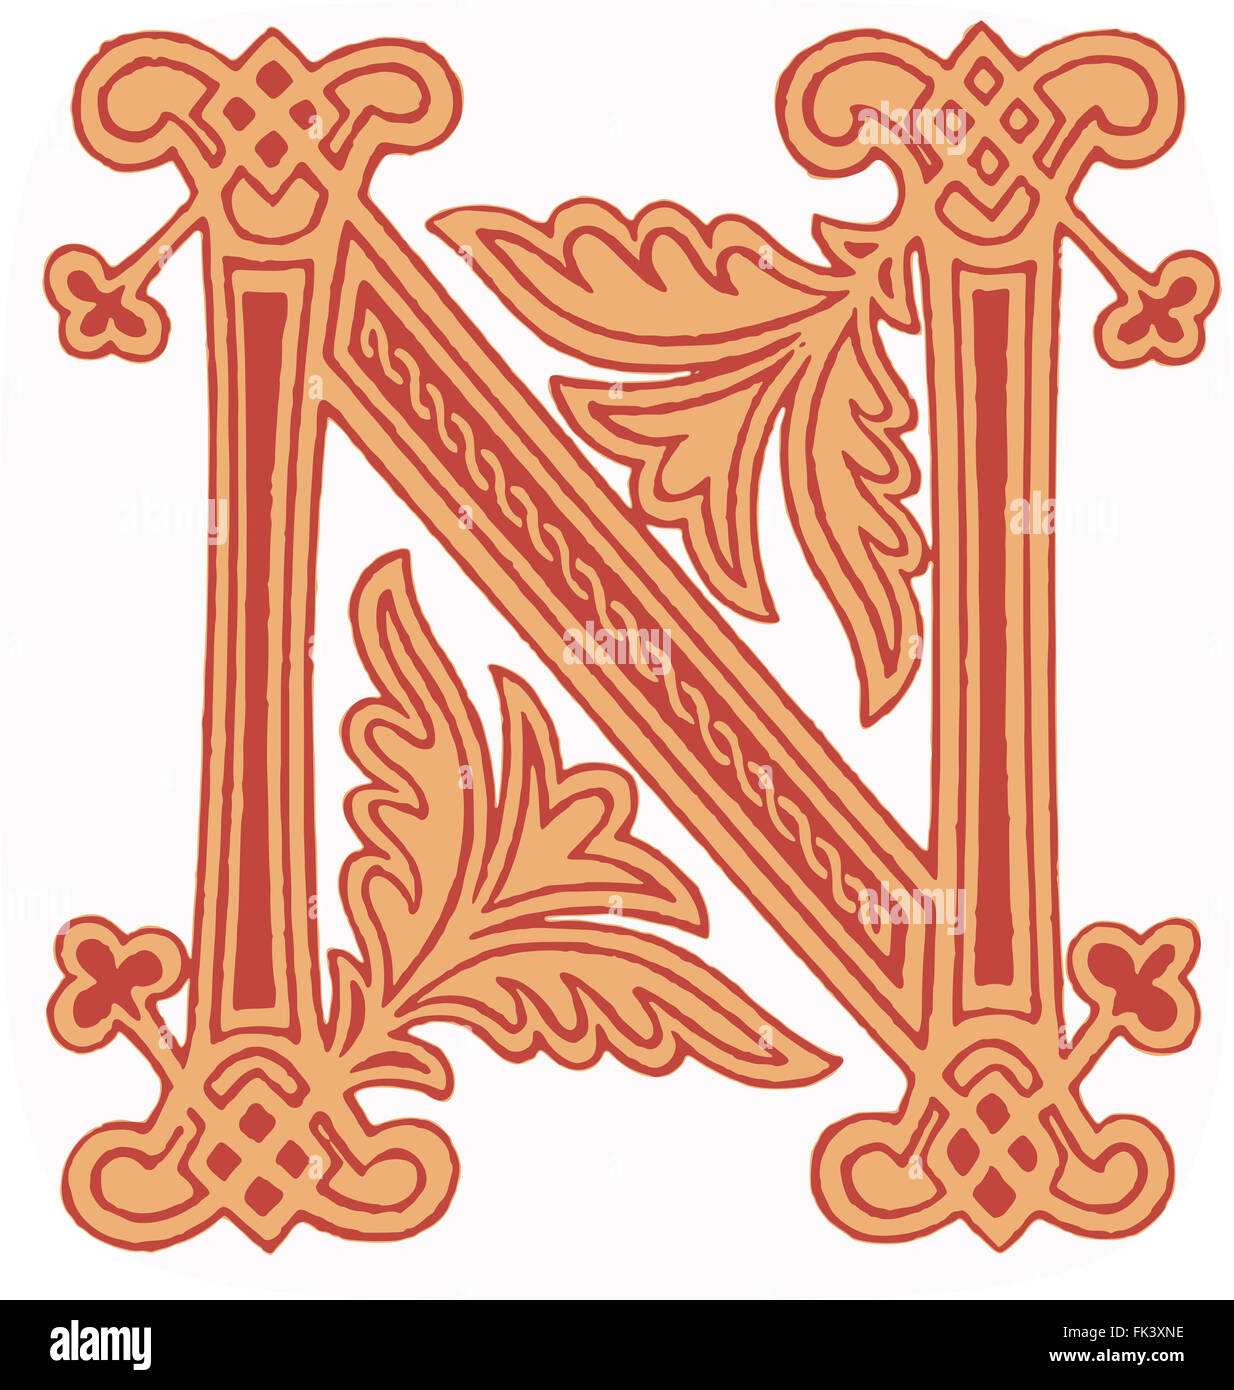 Anglo saxon gospel stock photos anglo saxon gospel stock images anglo saxon initial letter n stock image buycottarizona Images